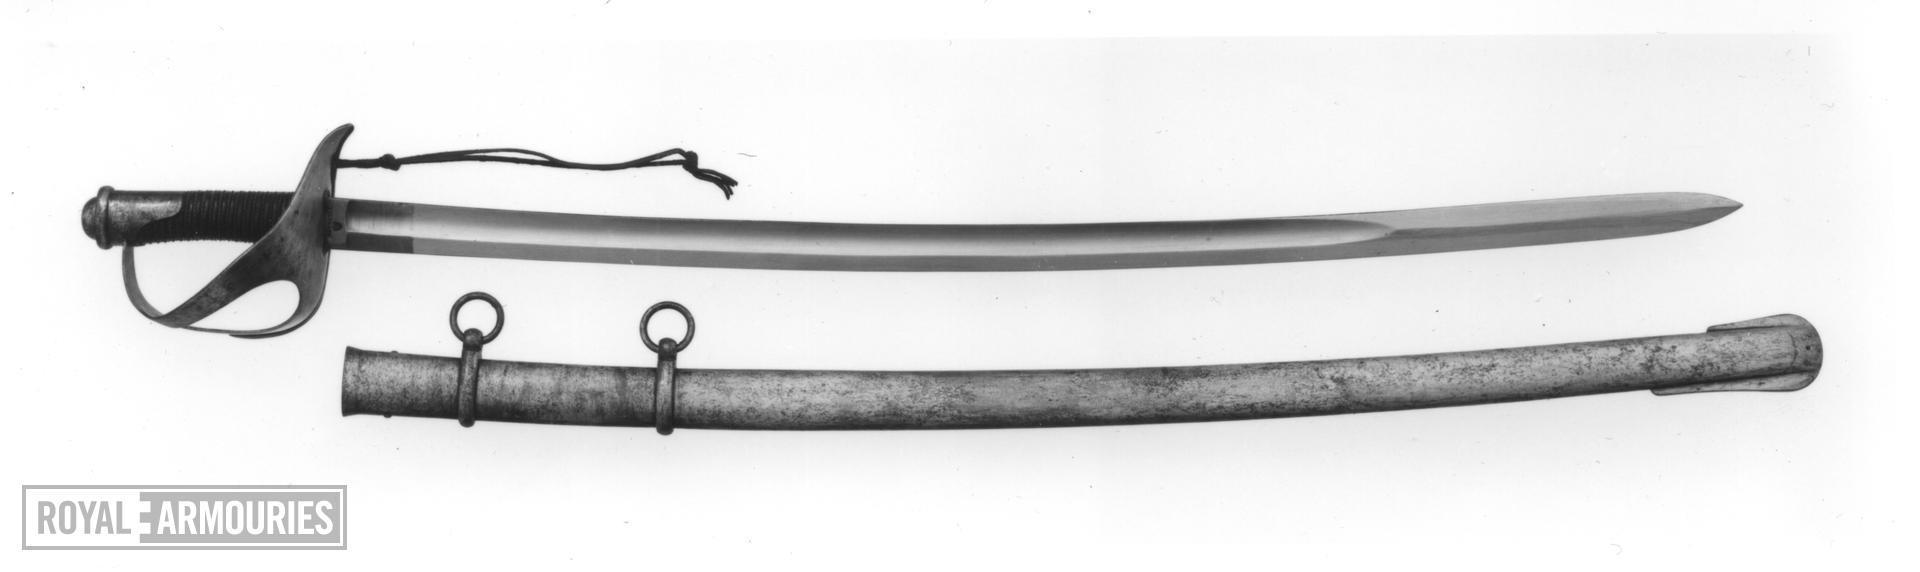 Sword and scabbard Model 1860 for cavalry and the Royal Horse carabineer toopers ('sciabola da Cavalleria Mod.1860 e da Carabinieri Reali a Cavallo')